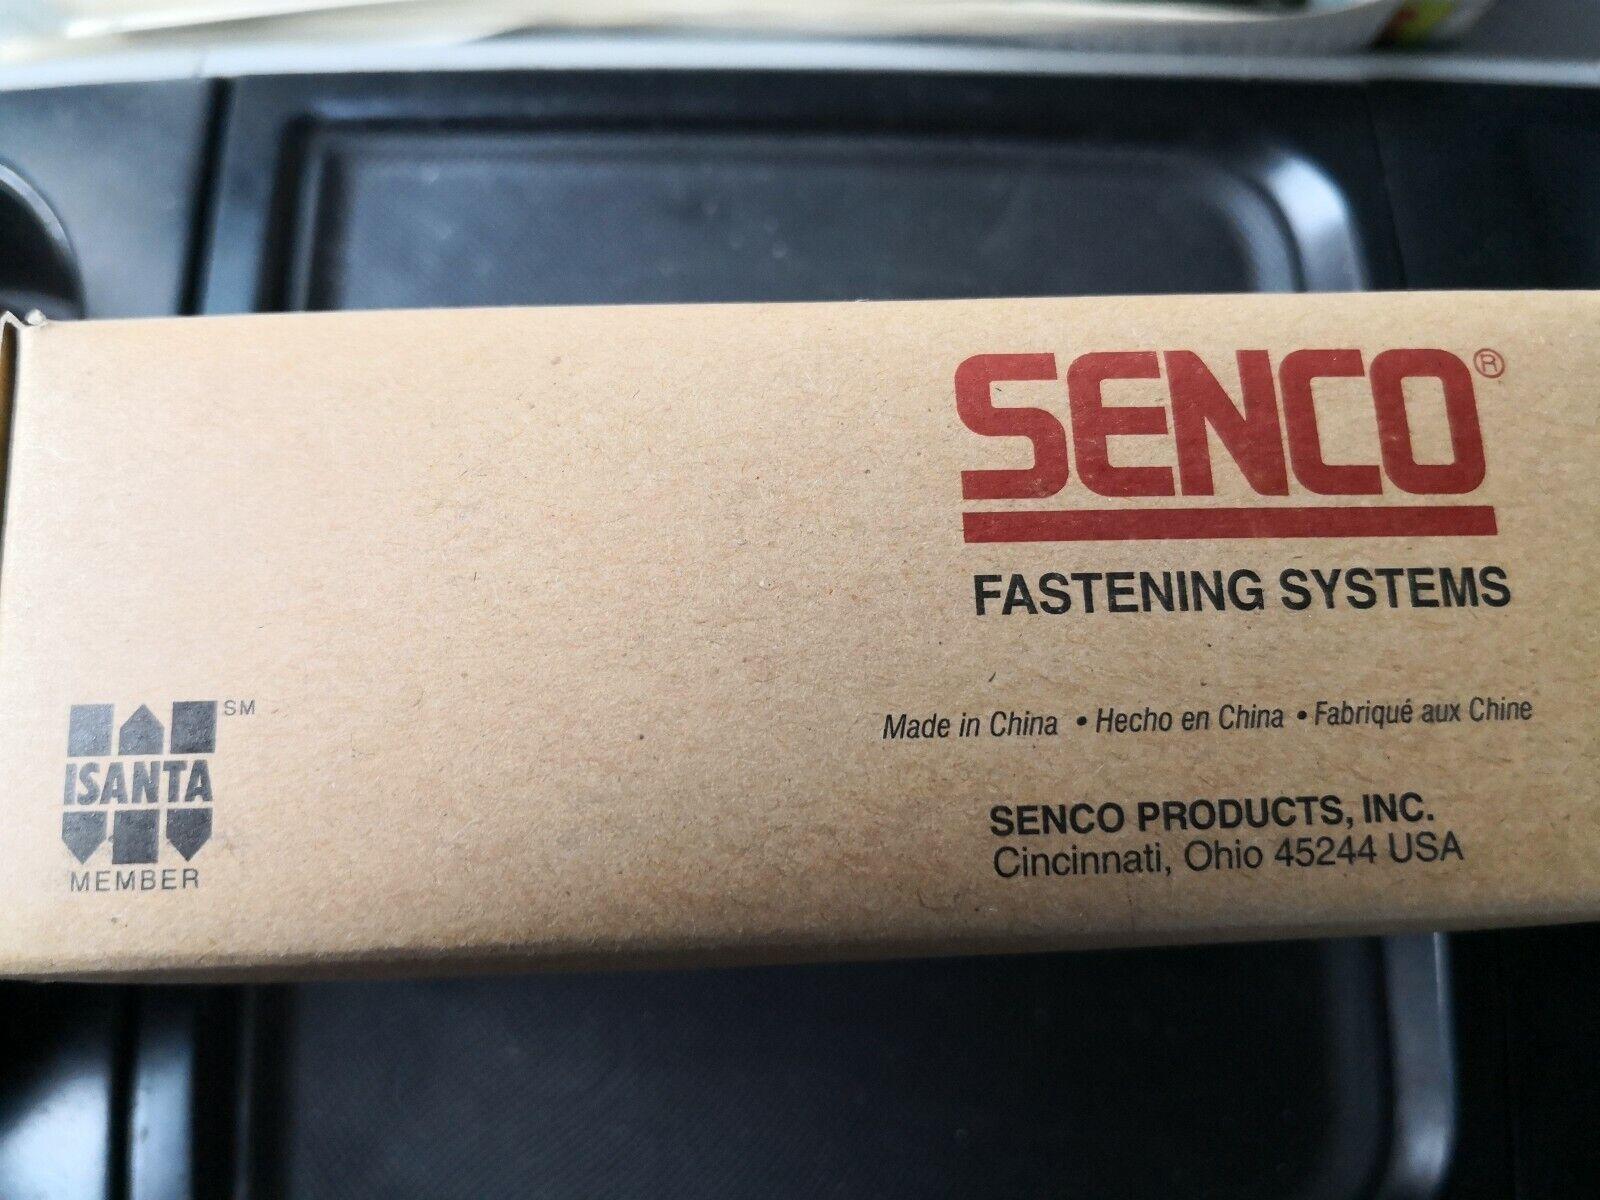 Senco J08BAAN 1//2 X 7//16 18Ga Galvanized Staple 5000 Per Box